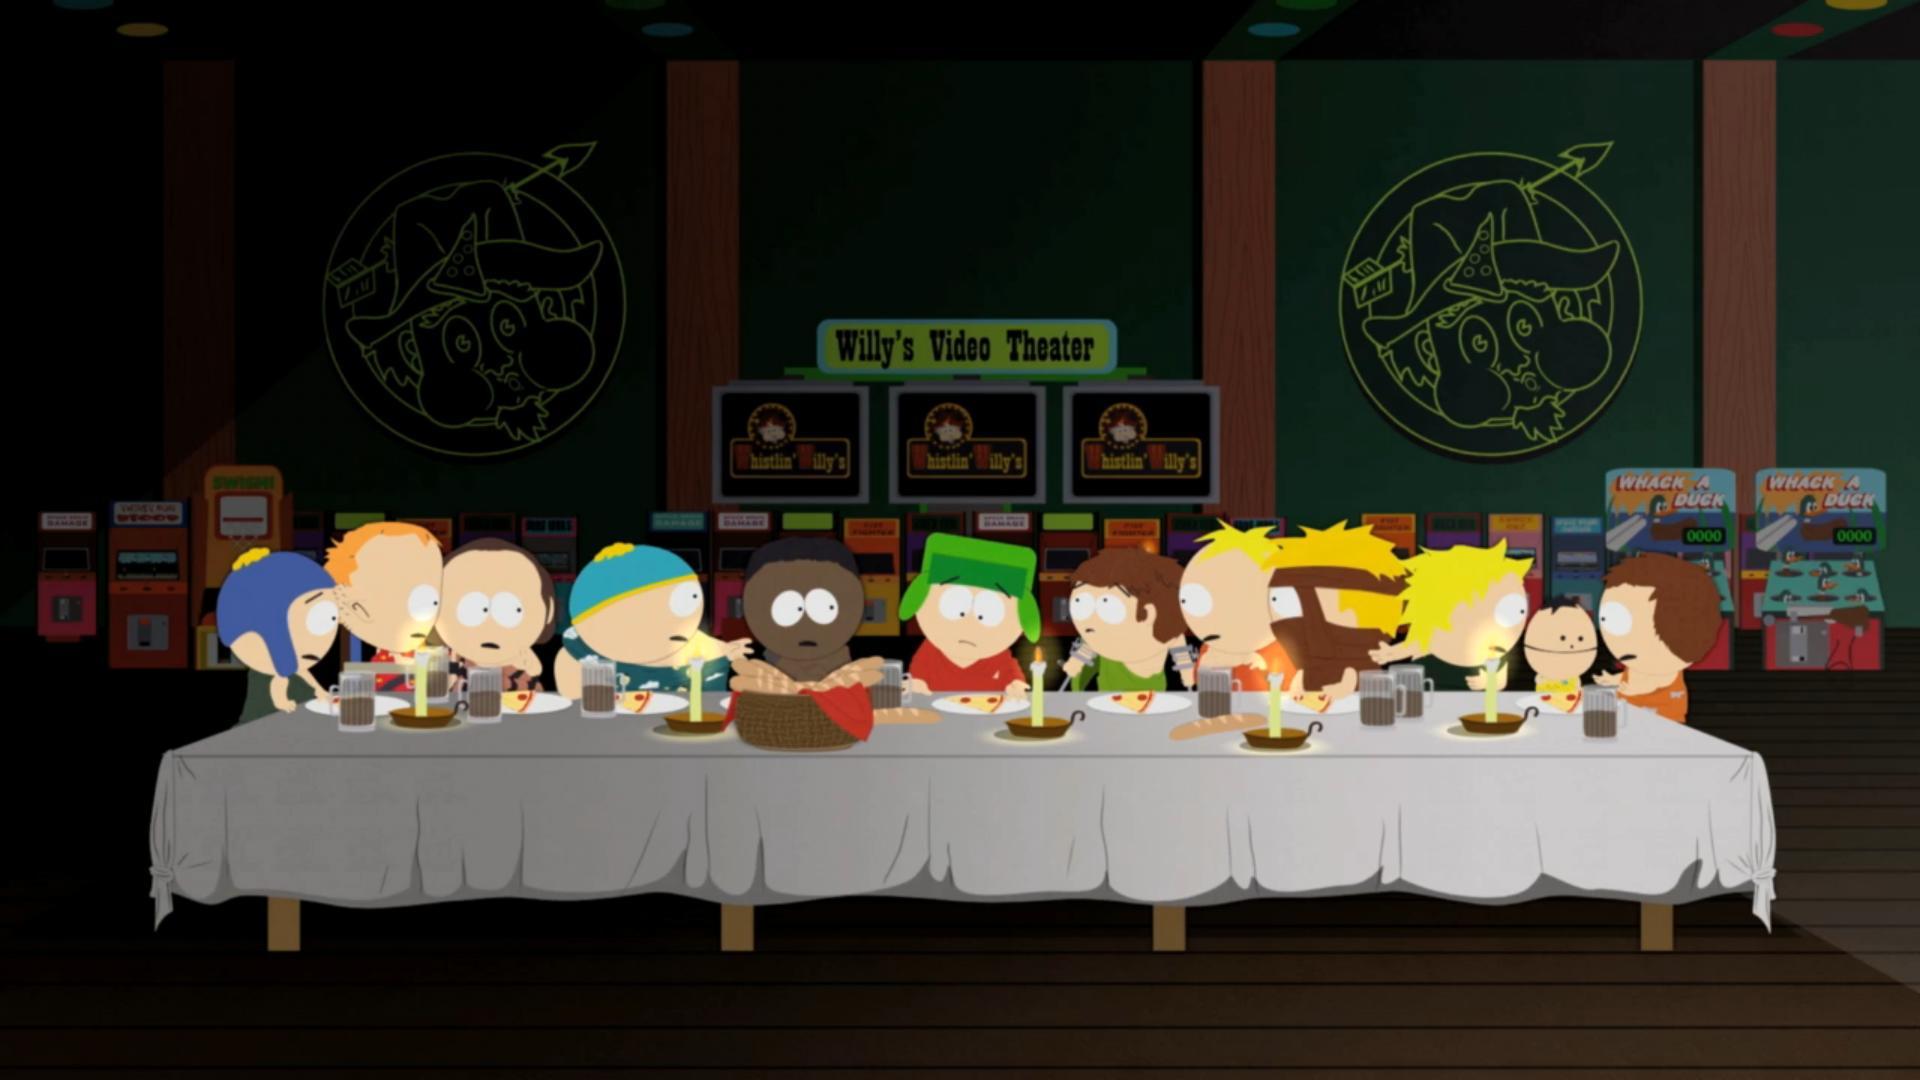 South Park wallpaper 4